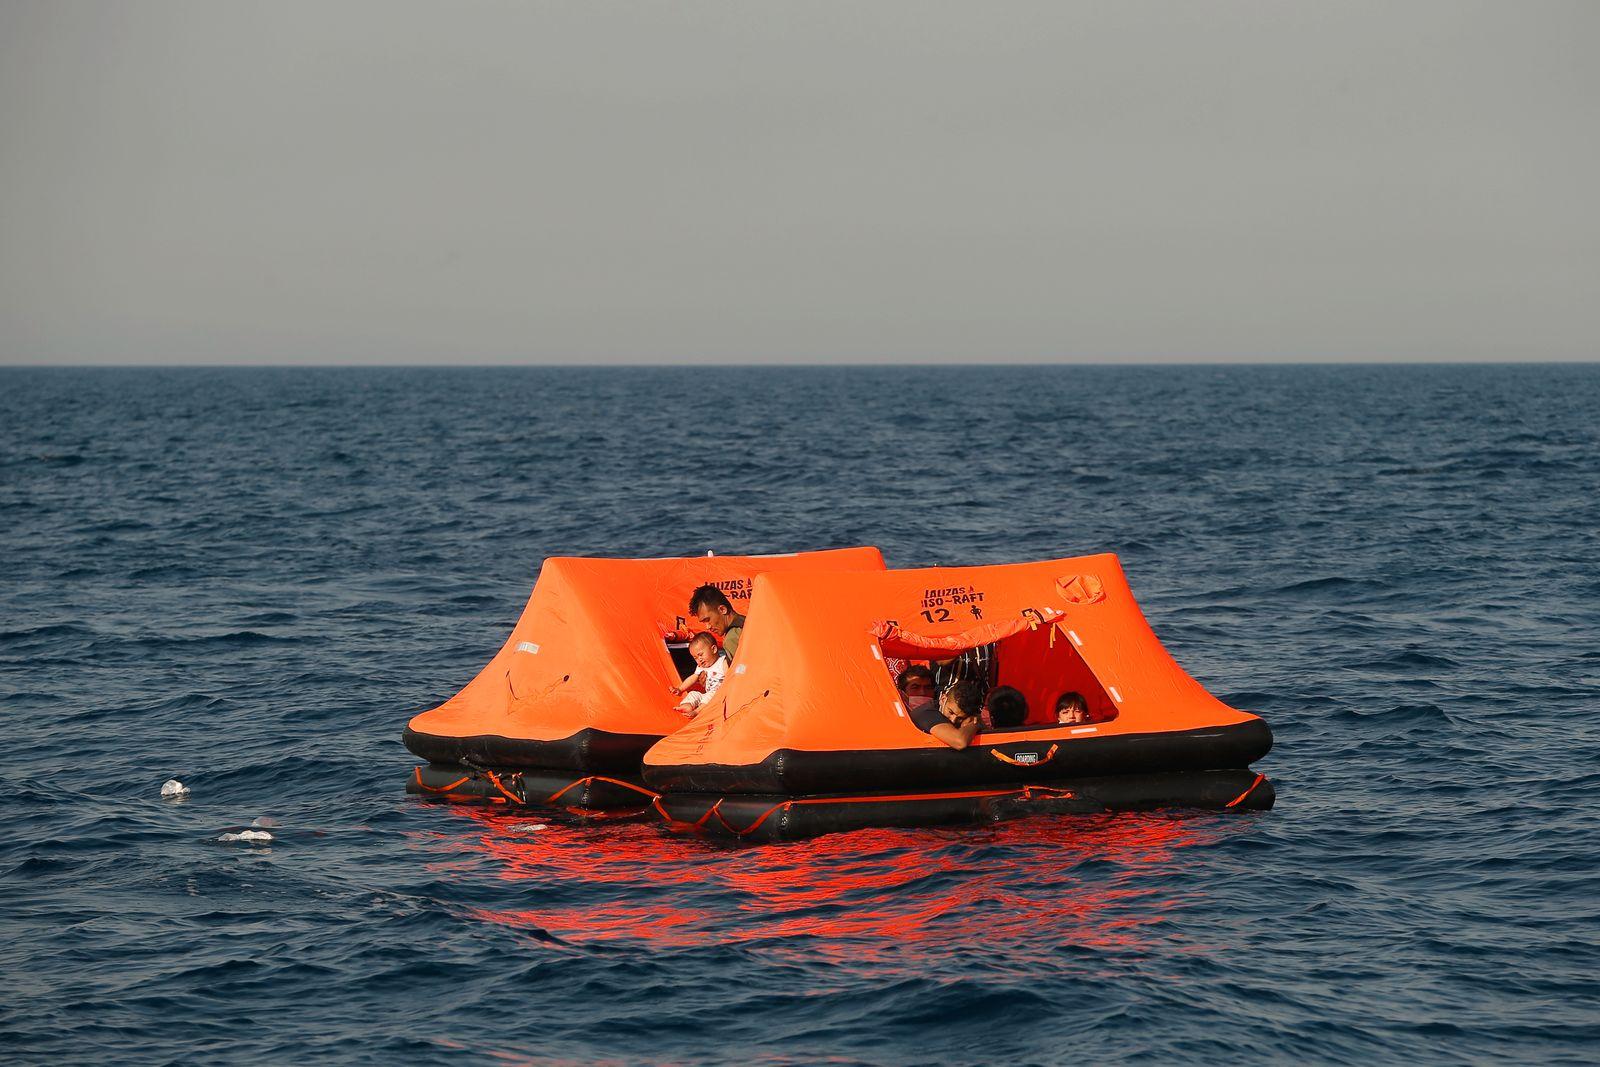 Turkey Greece Migrants